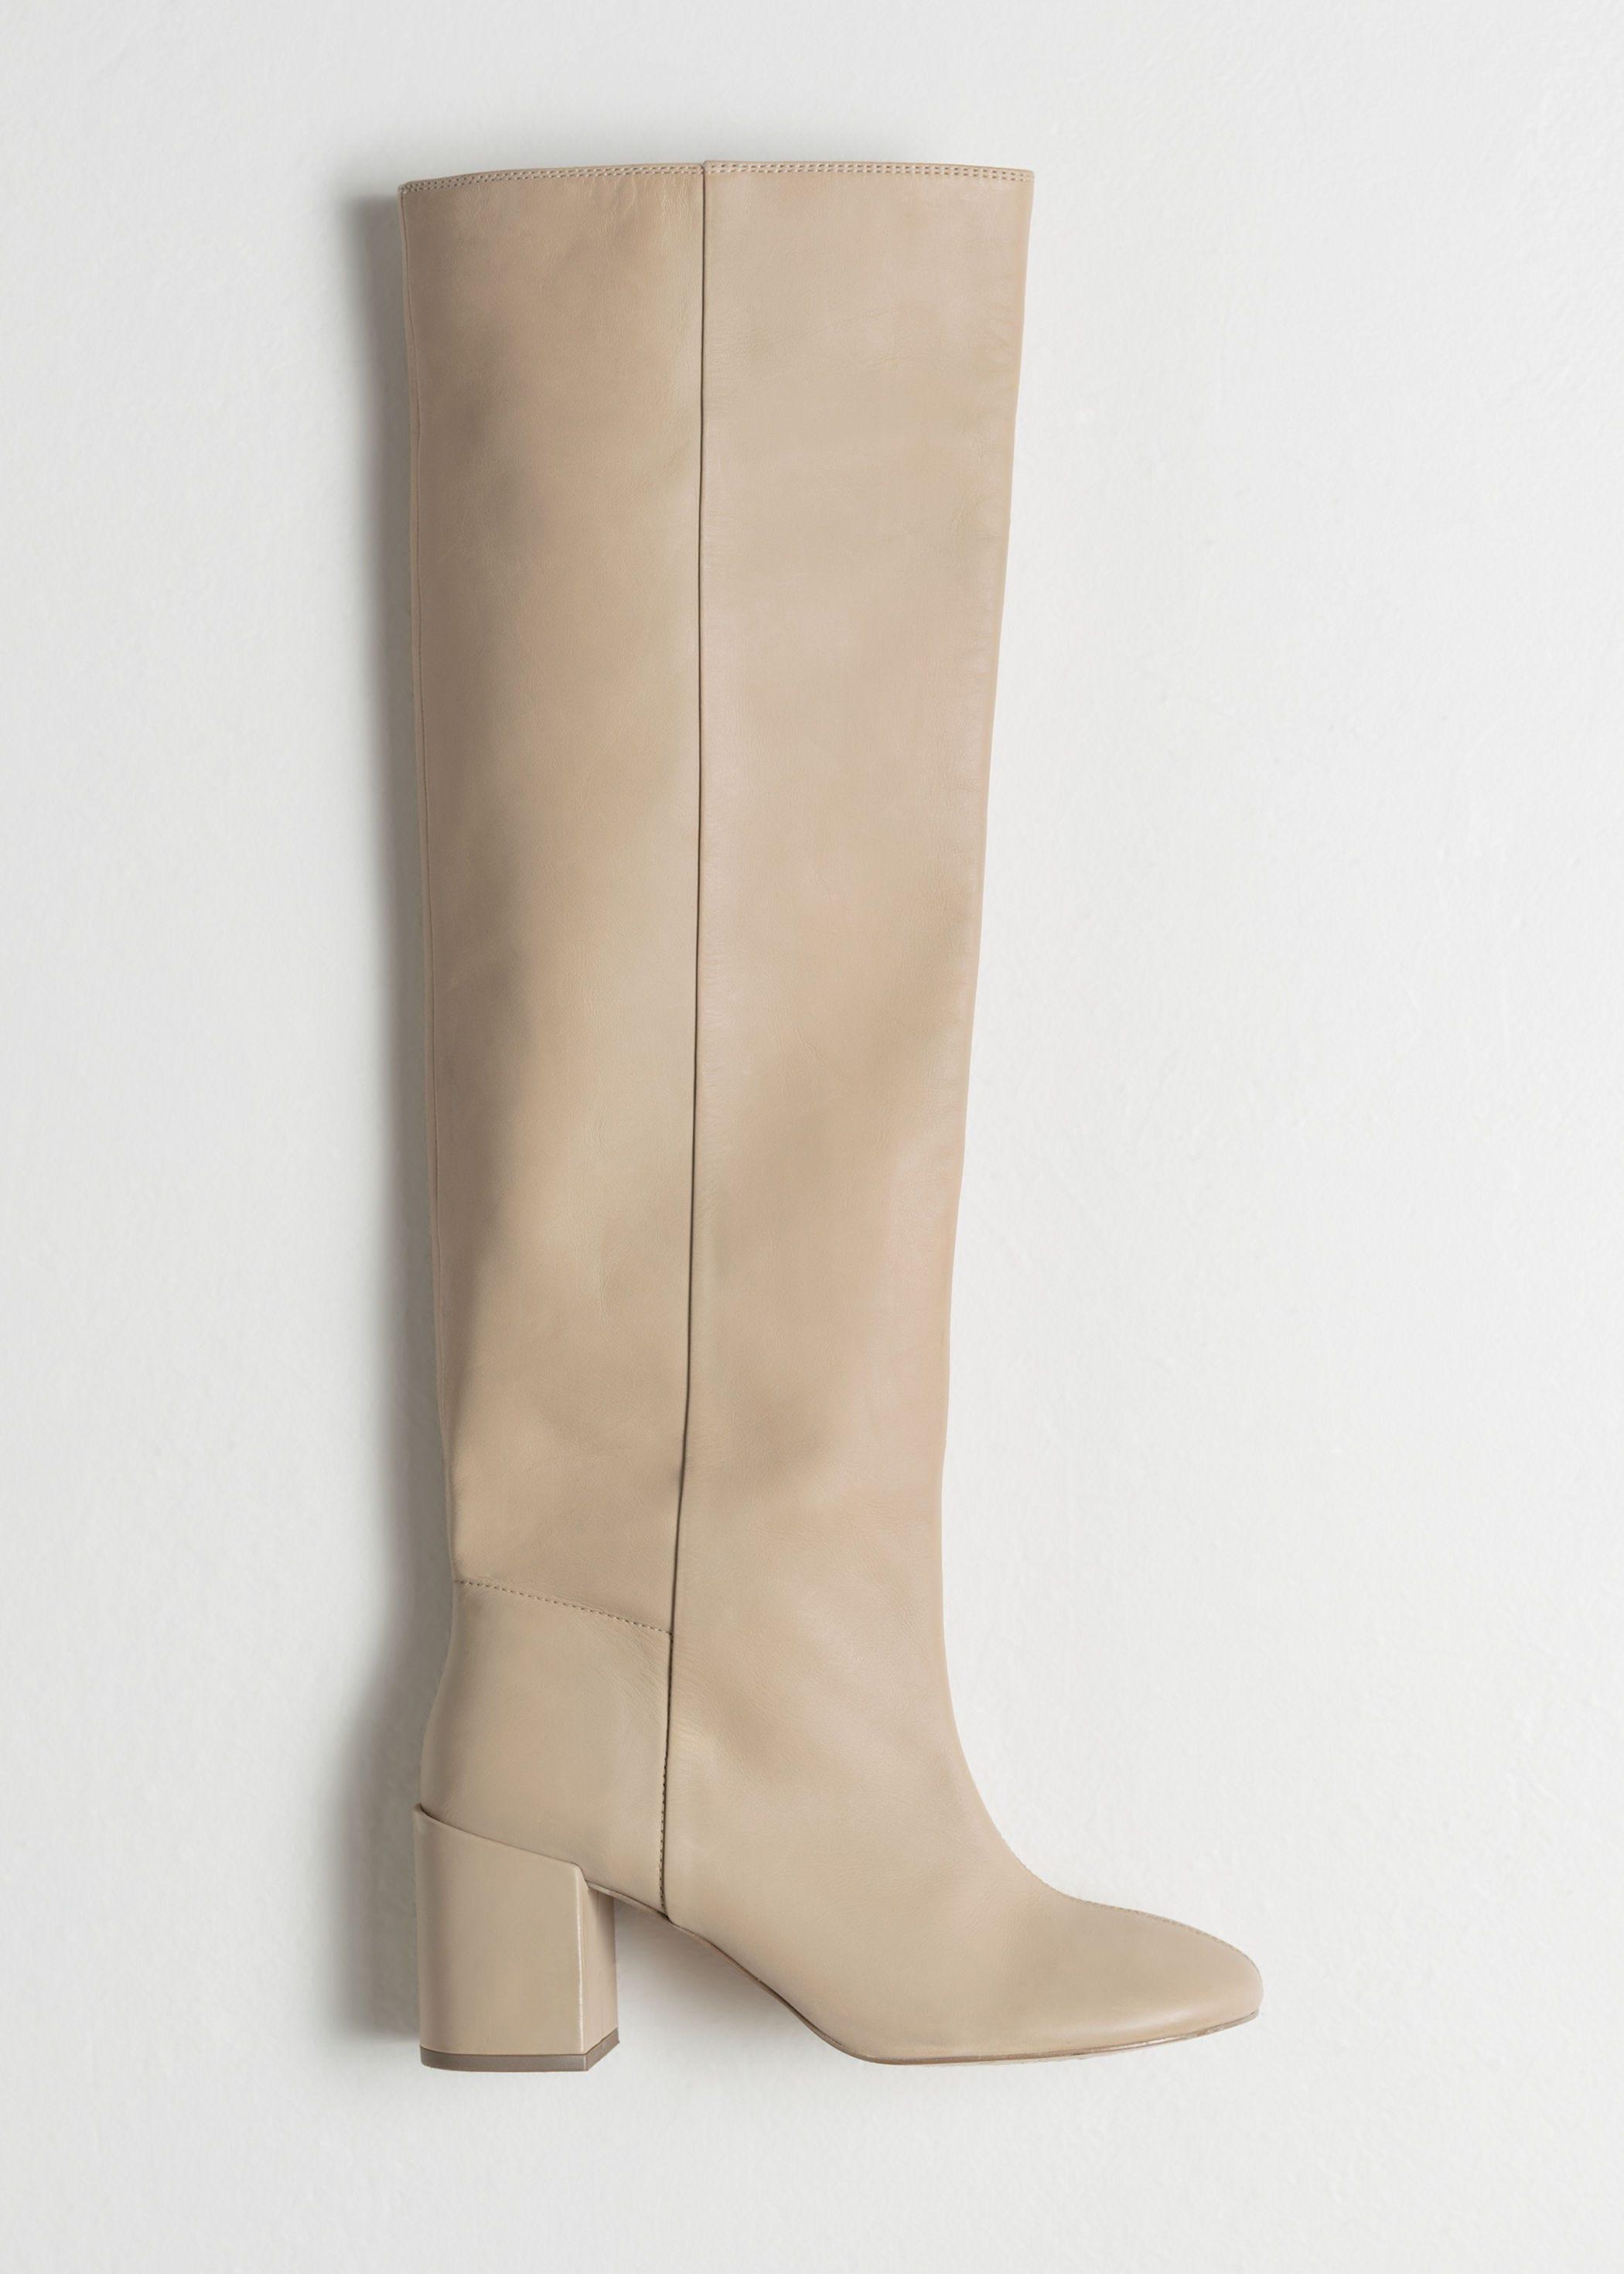 a24e37e6627033 Womens Boots Trends - Best Winter 2019 Boot Styles